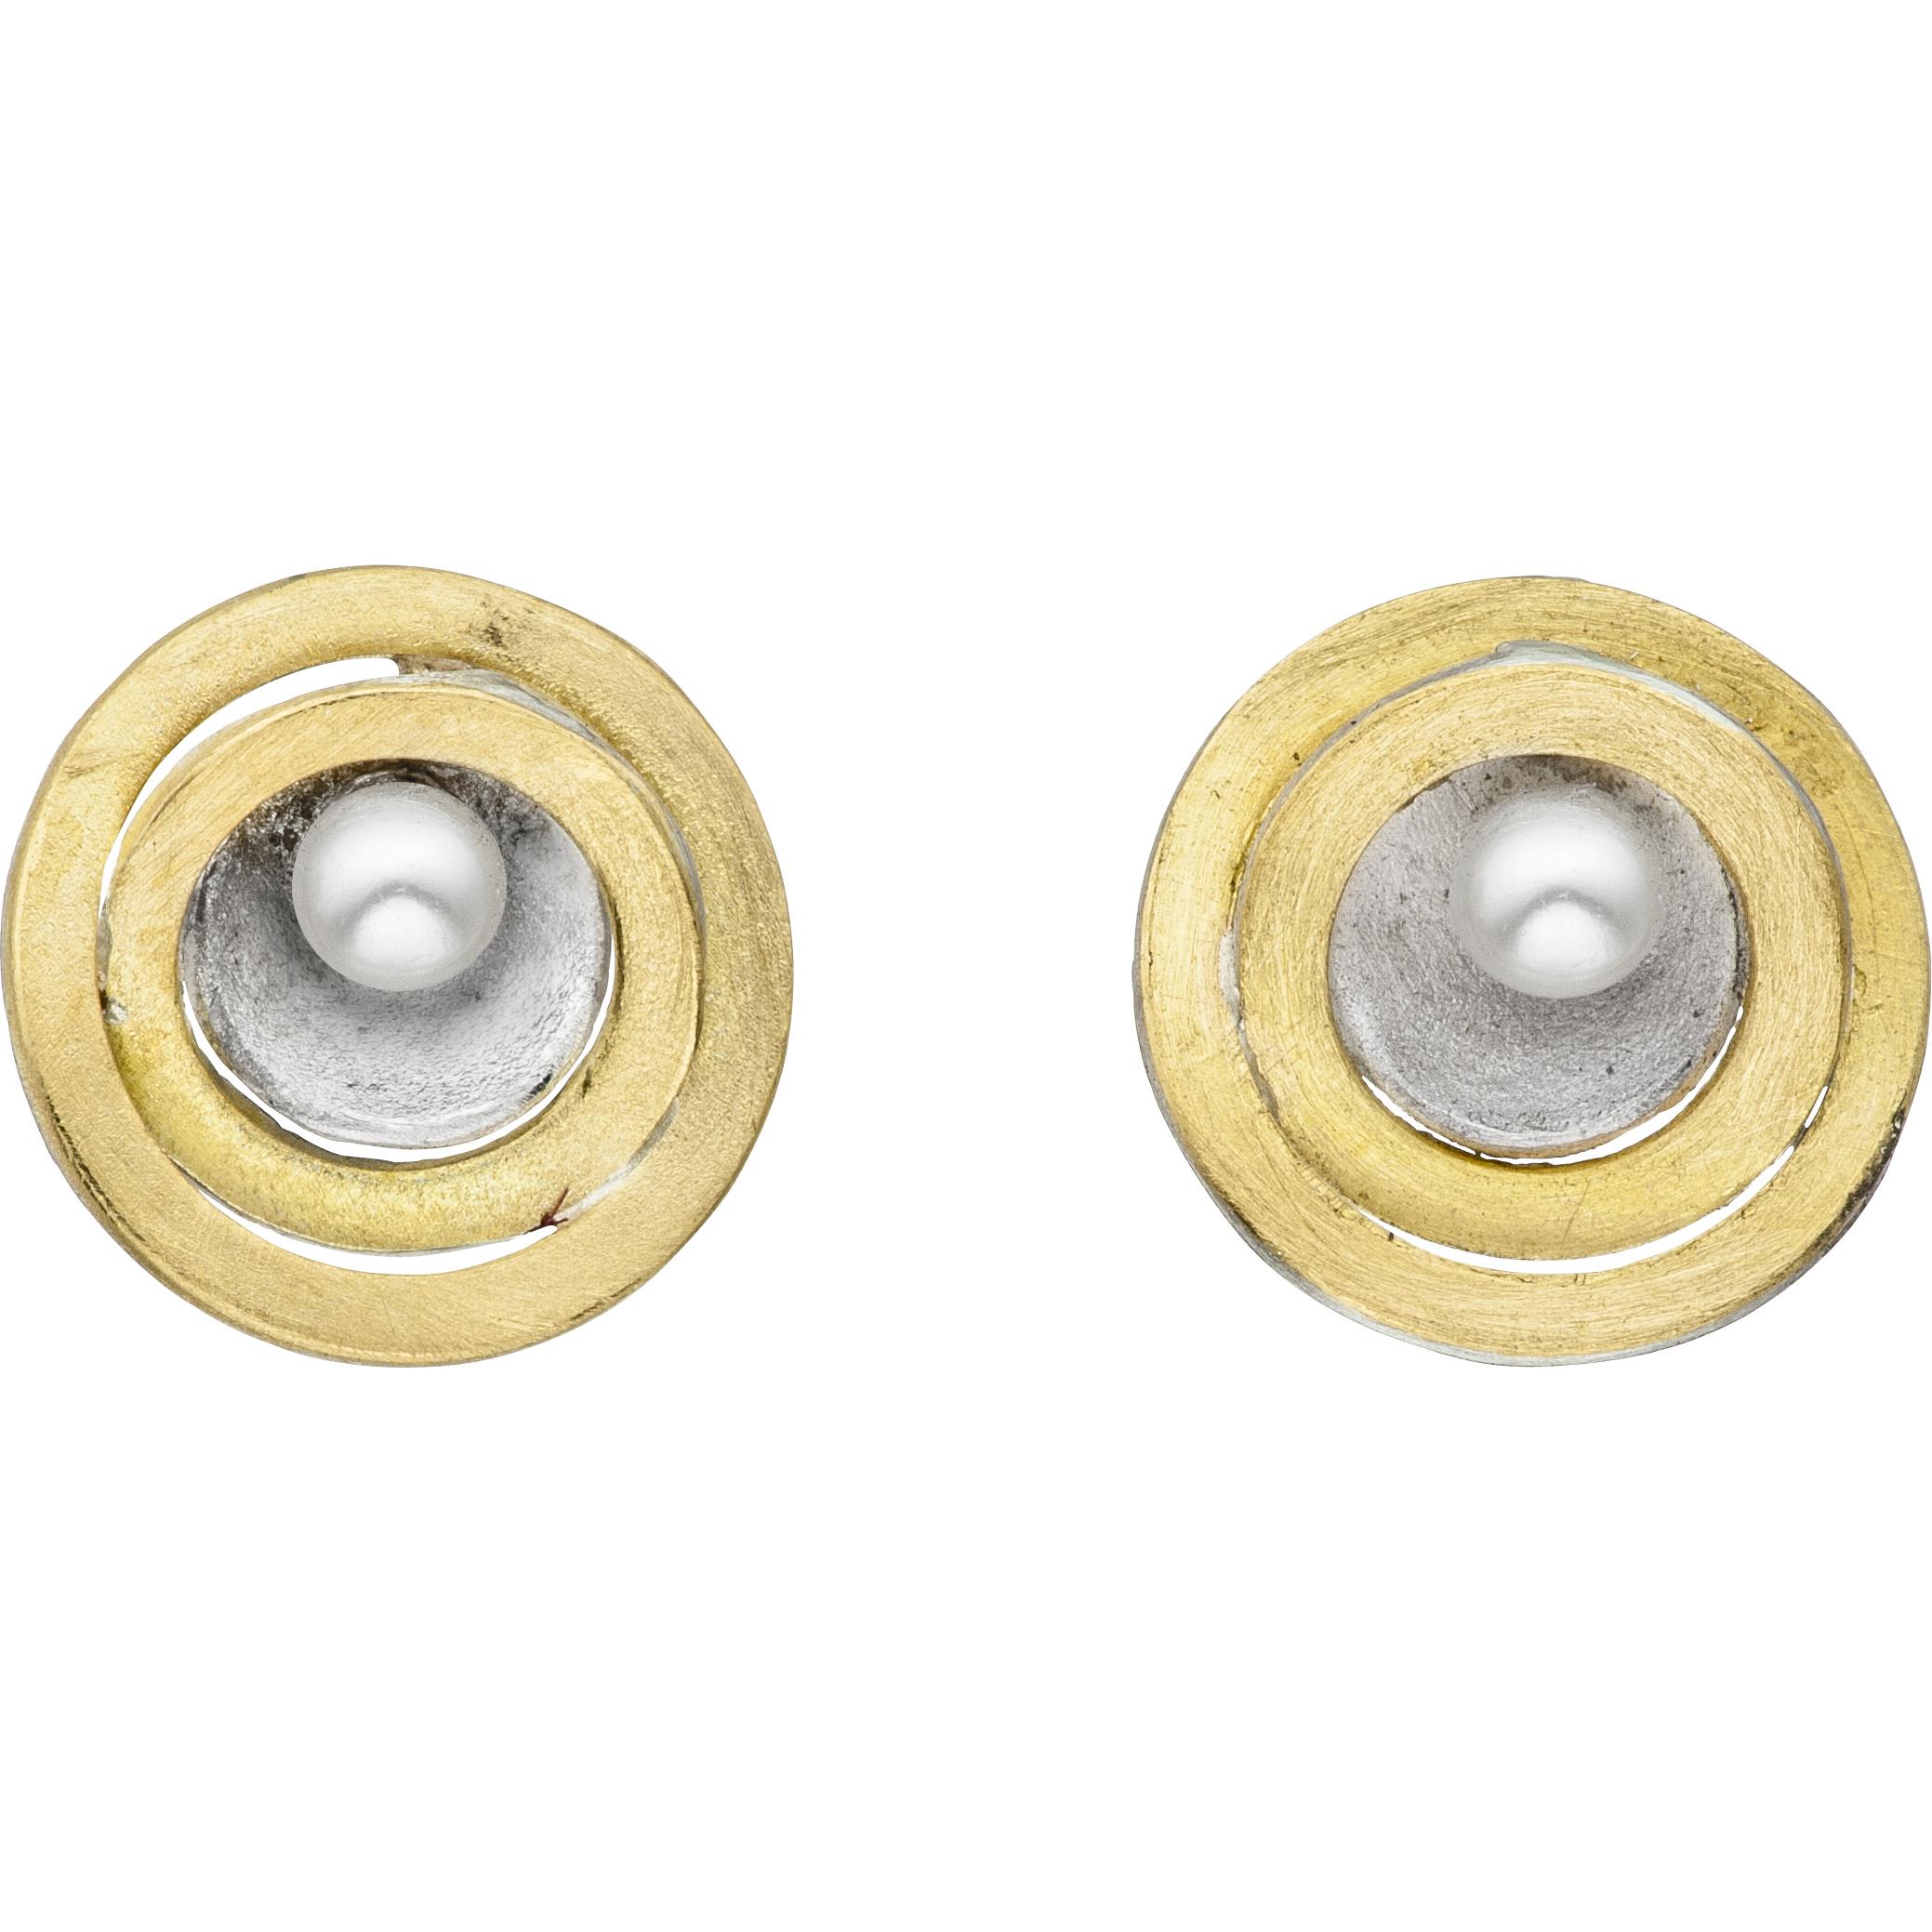 Manu Rings Of Saturn Studs